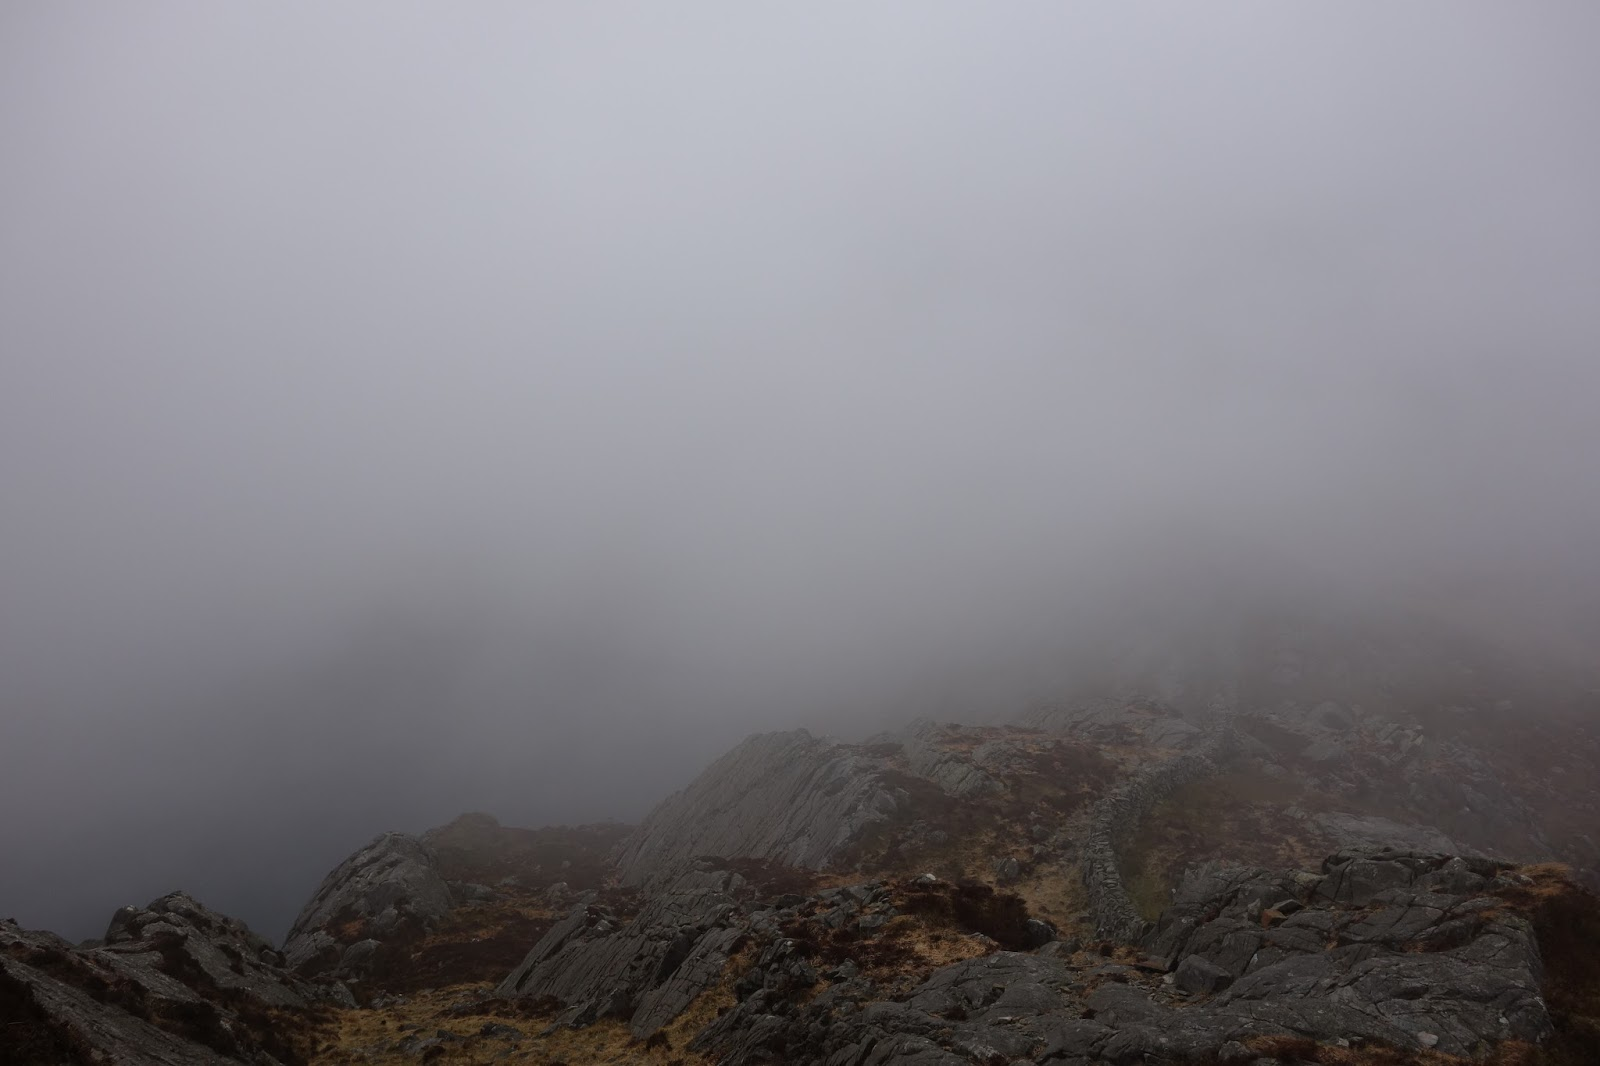 Hill fog in Snowdonia